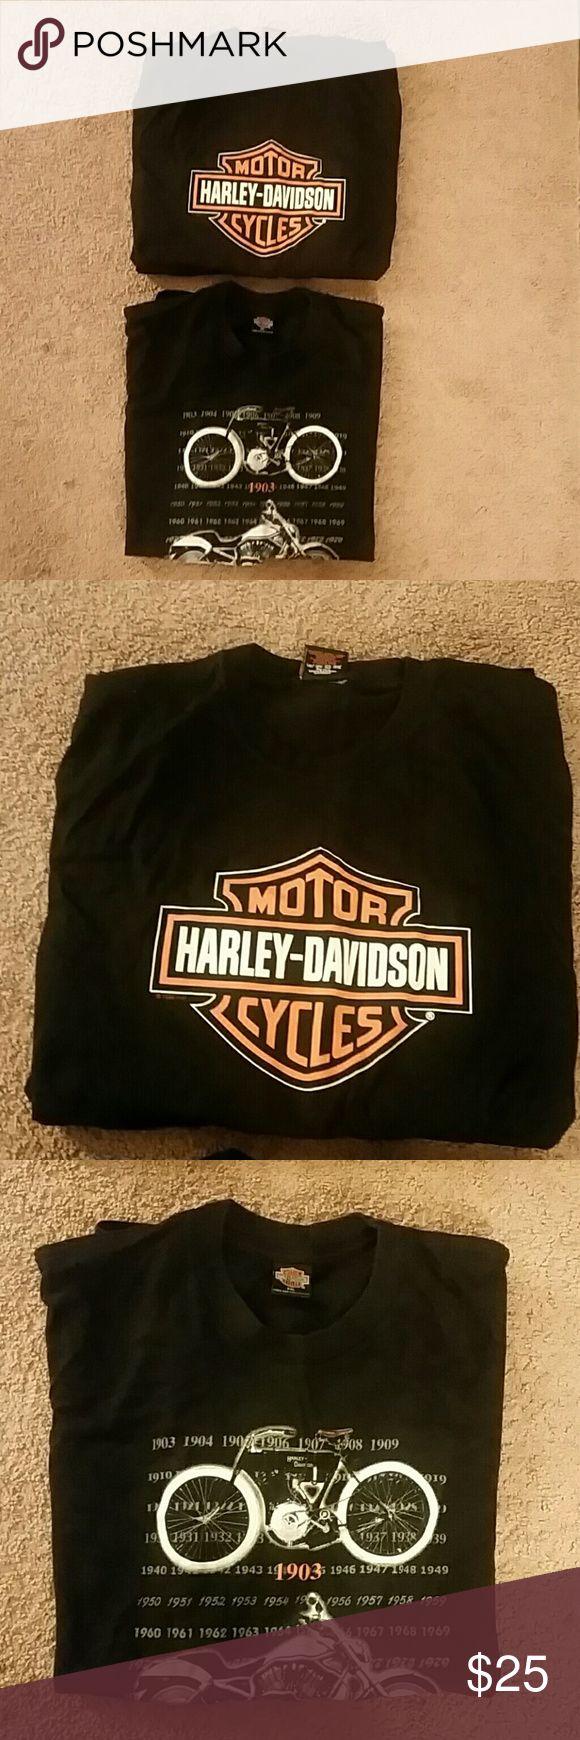 Mens Harley Davidson T-Shirts Bundle Of 2 Savannah,Georgia and Harley World Amsterdam  Holland T-shirts. In good condition. Harley-Davidson Shirts Tees - Short Sleeve